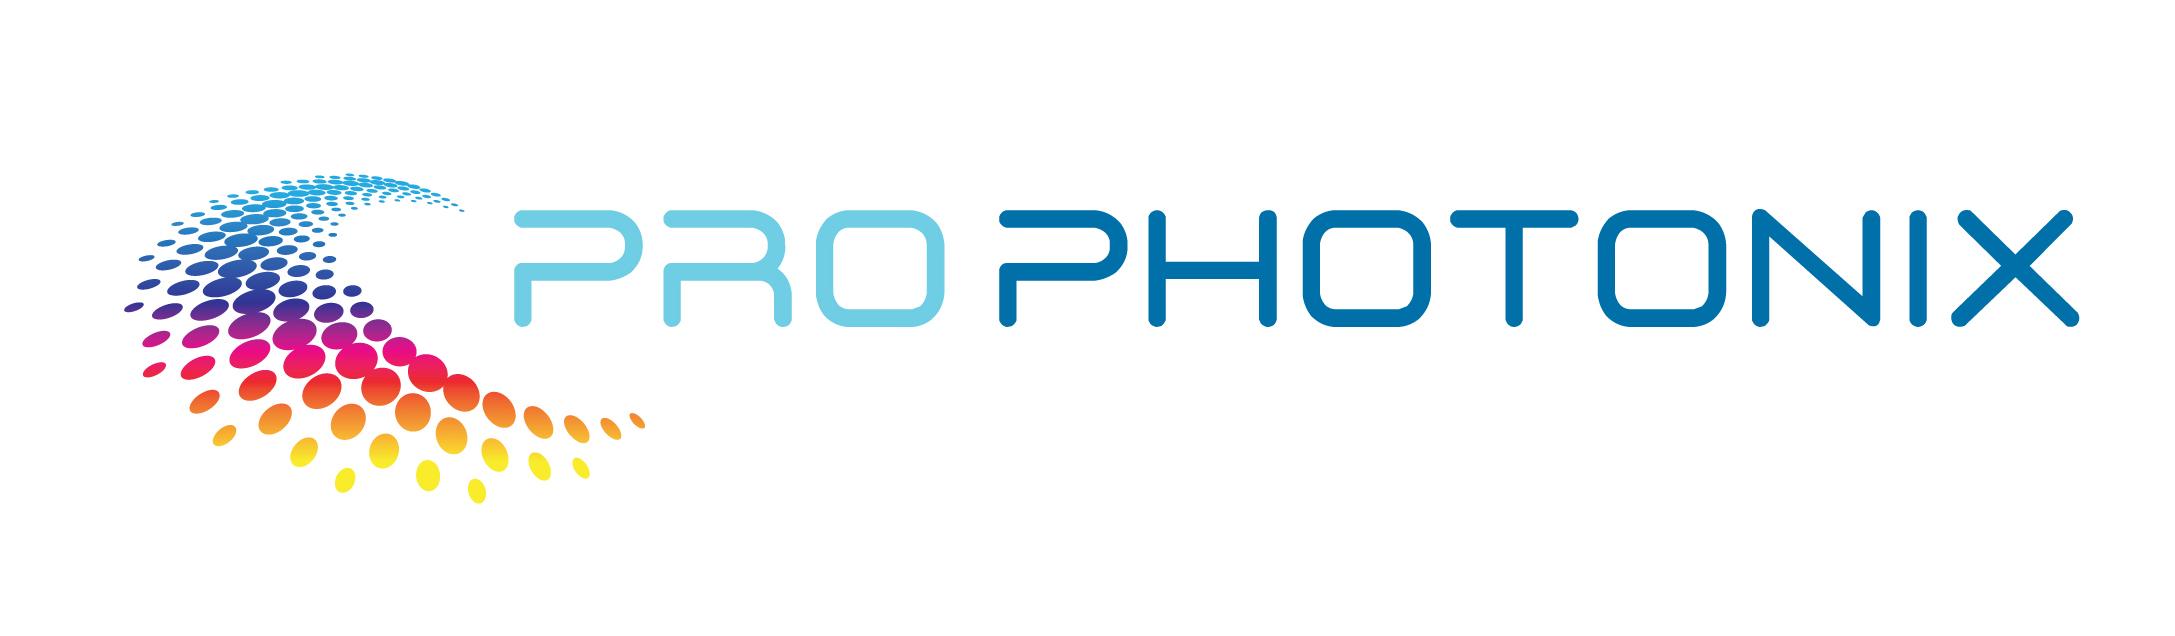 ProPhotonix Limited